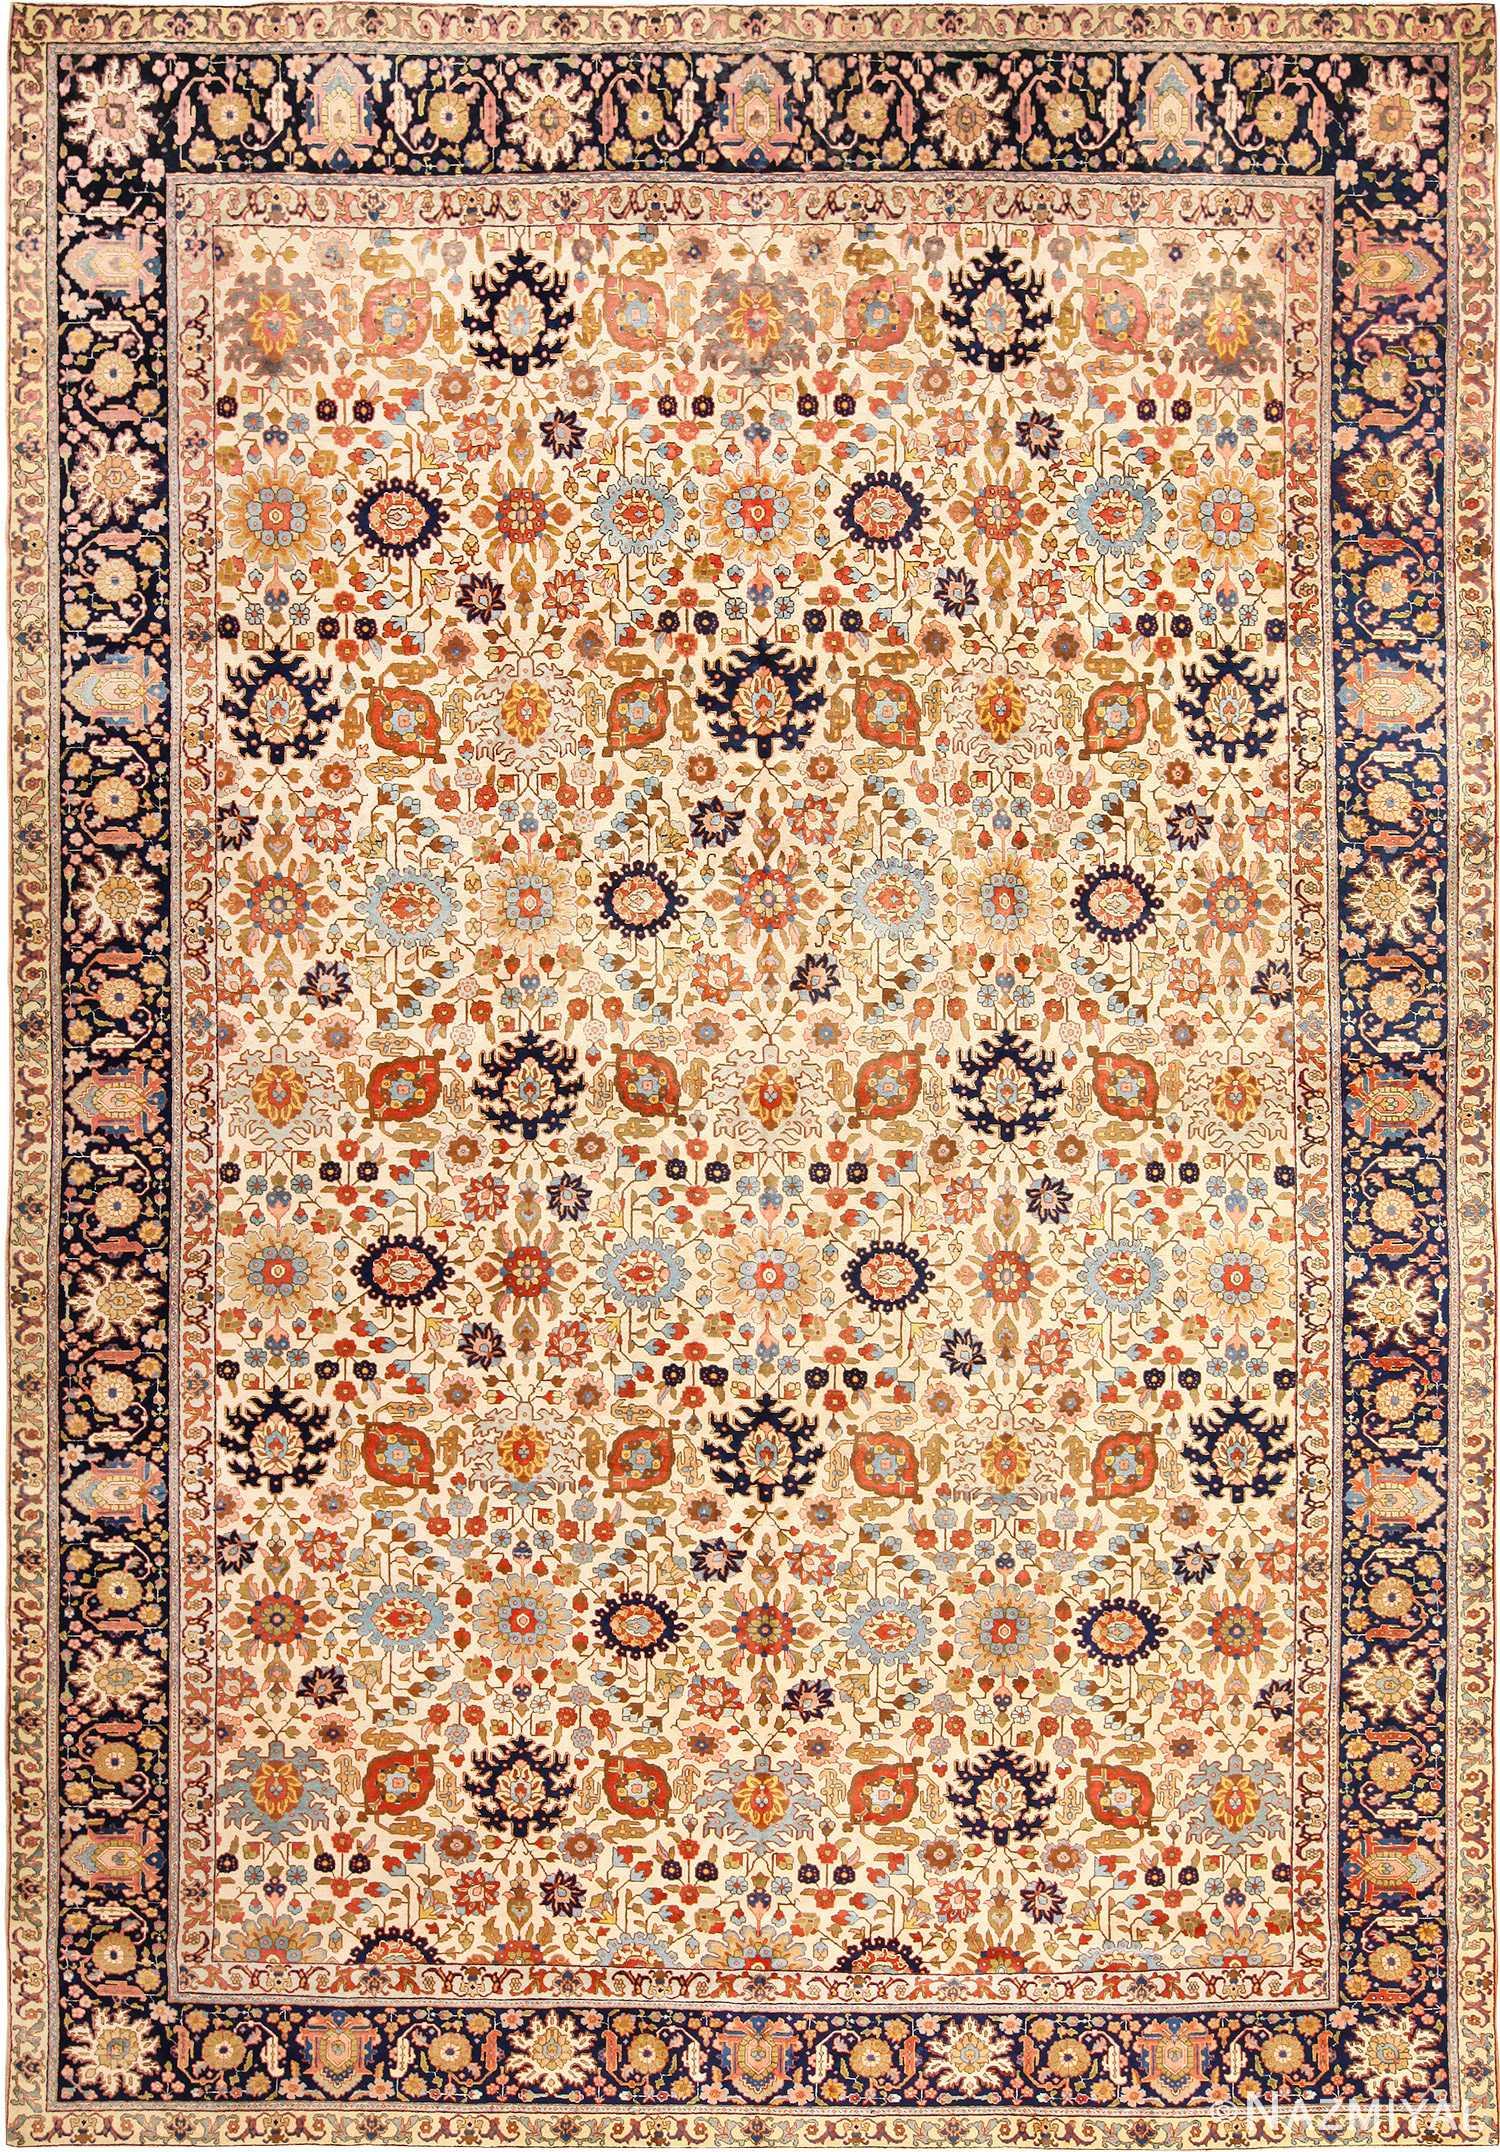 Fine Antique Ivory Background Persian Tabriz Rug 49191 by Nazmiyal